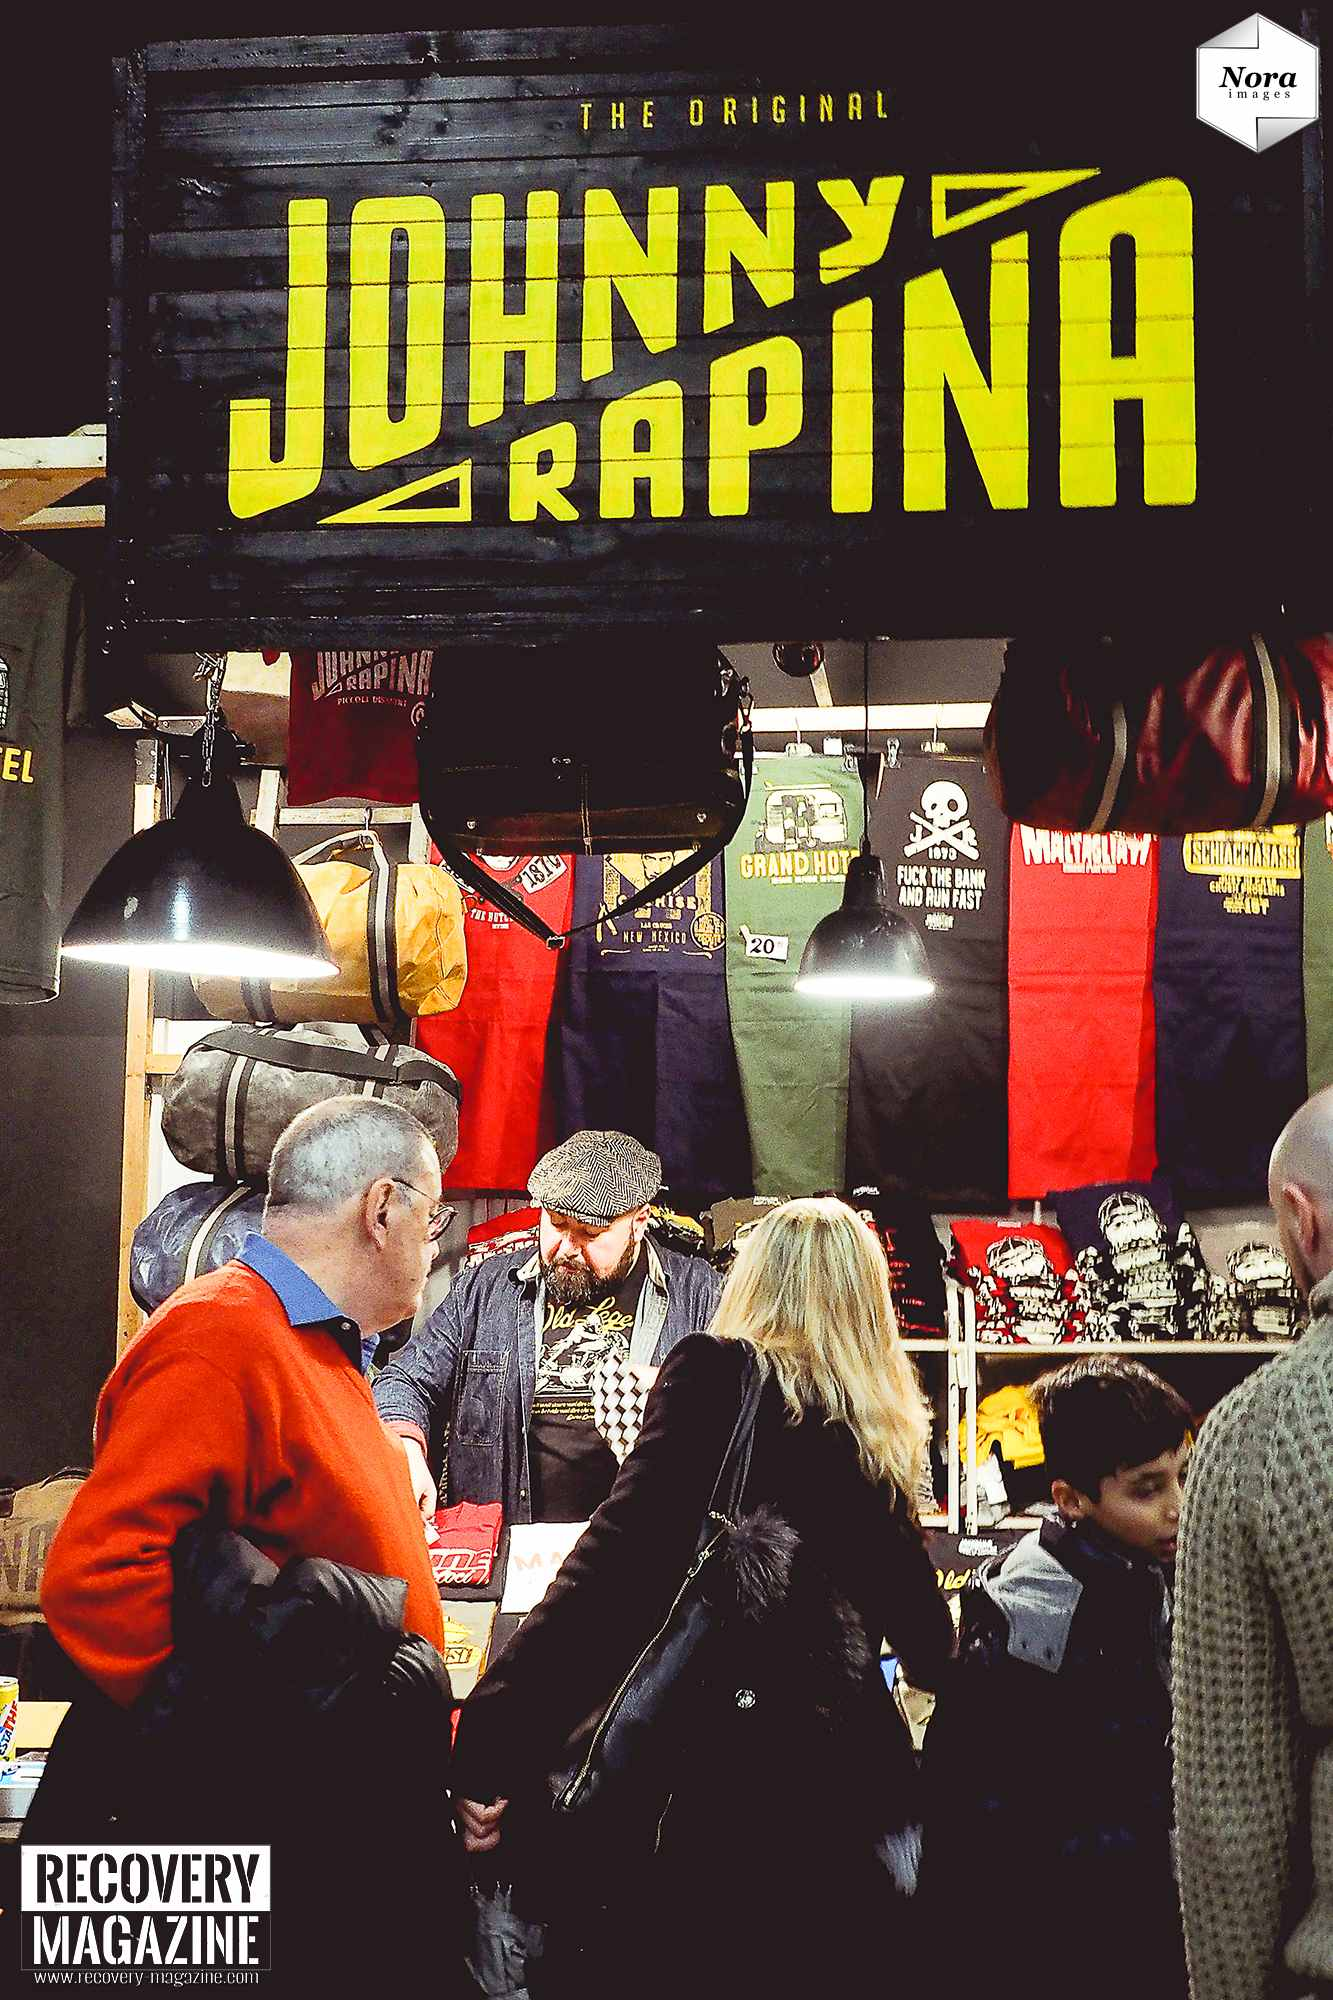 Milano Tattoo Convention Johnny rapina nora images